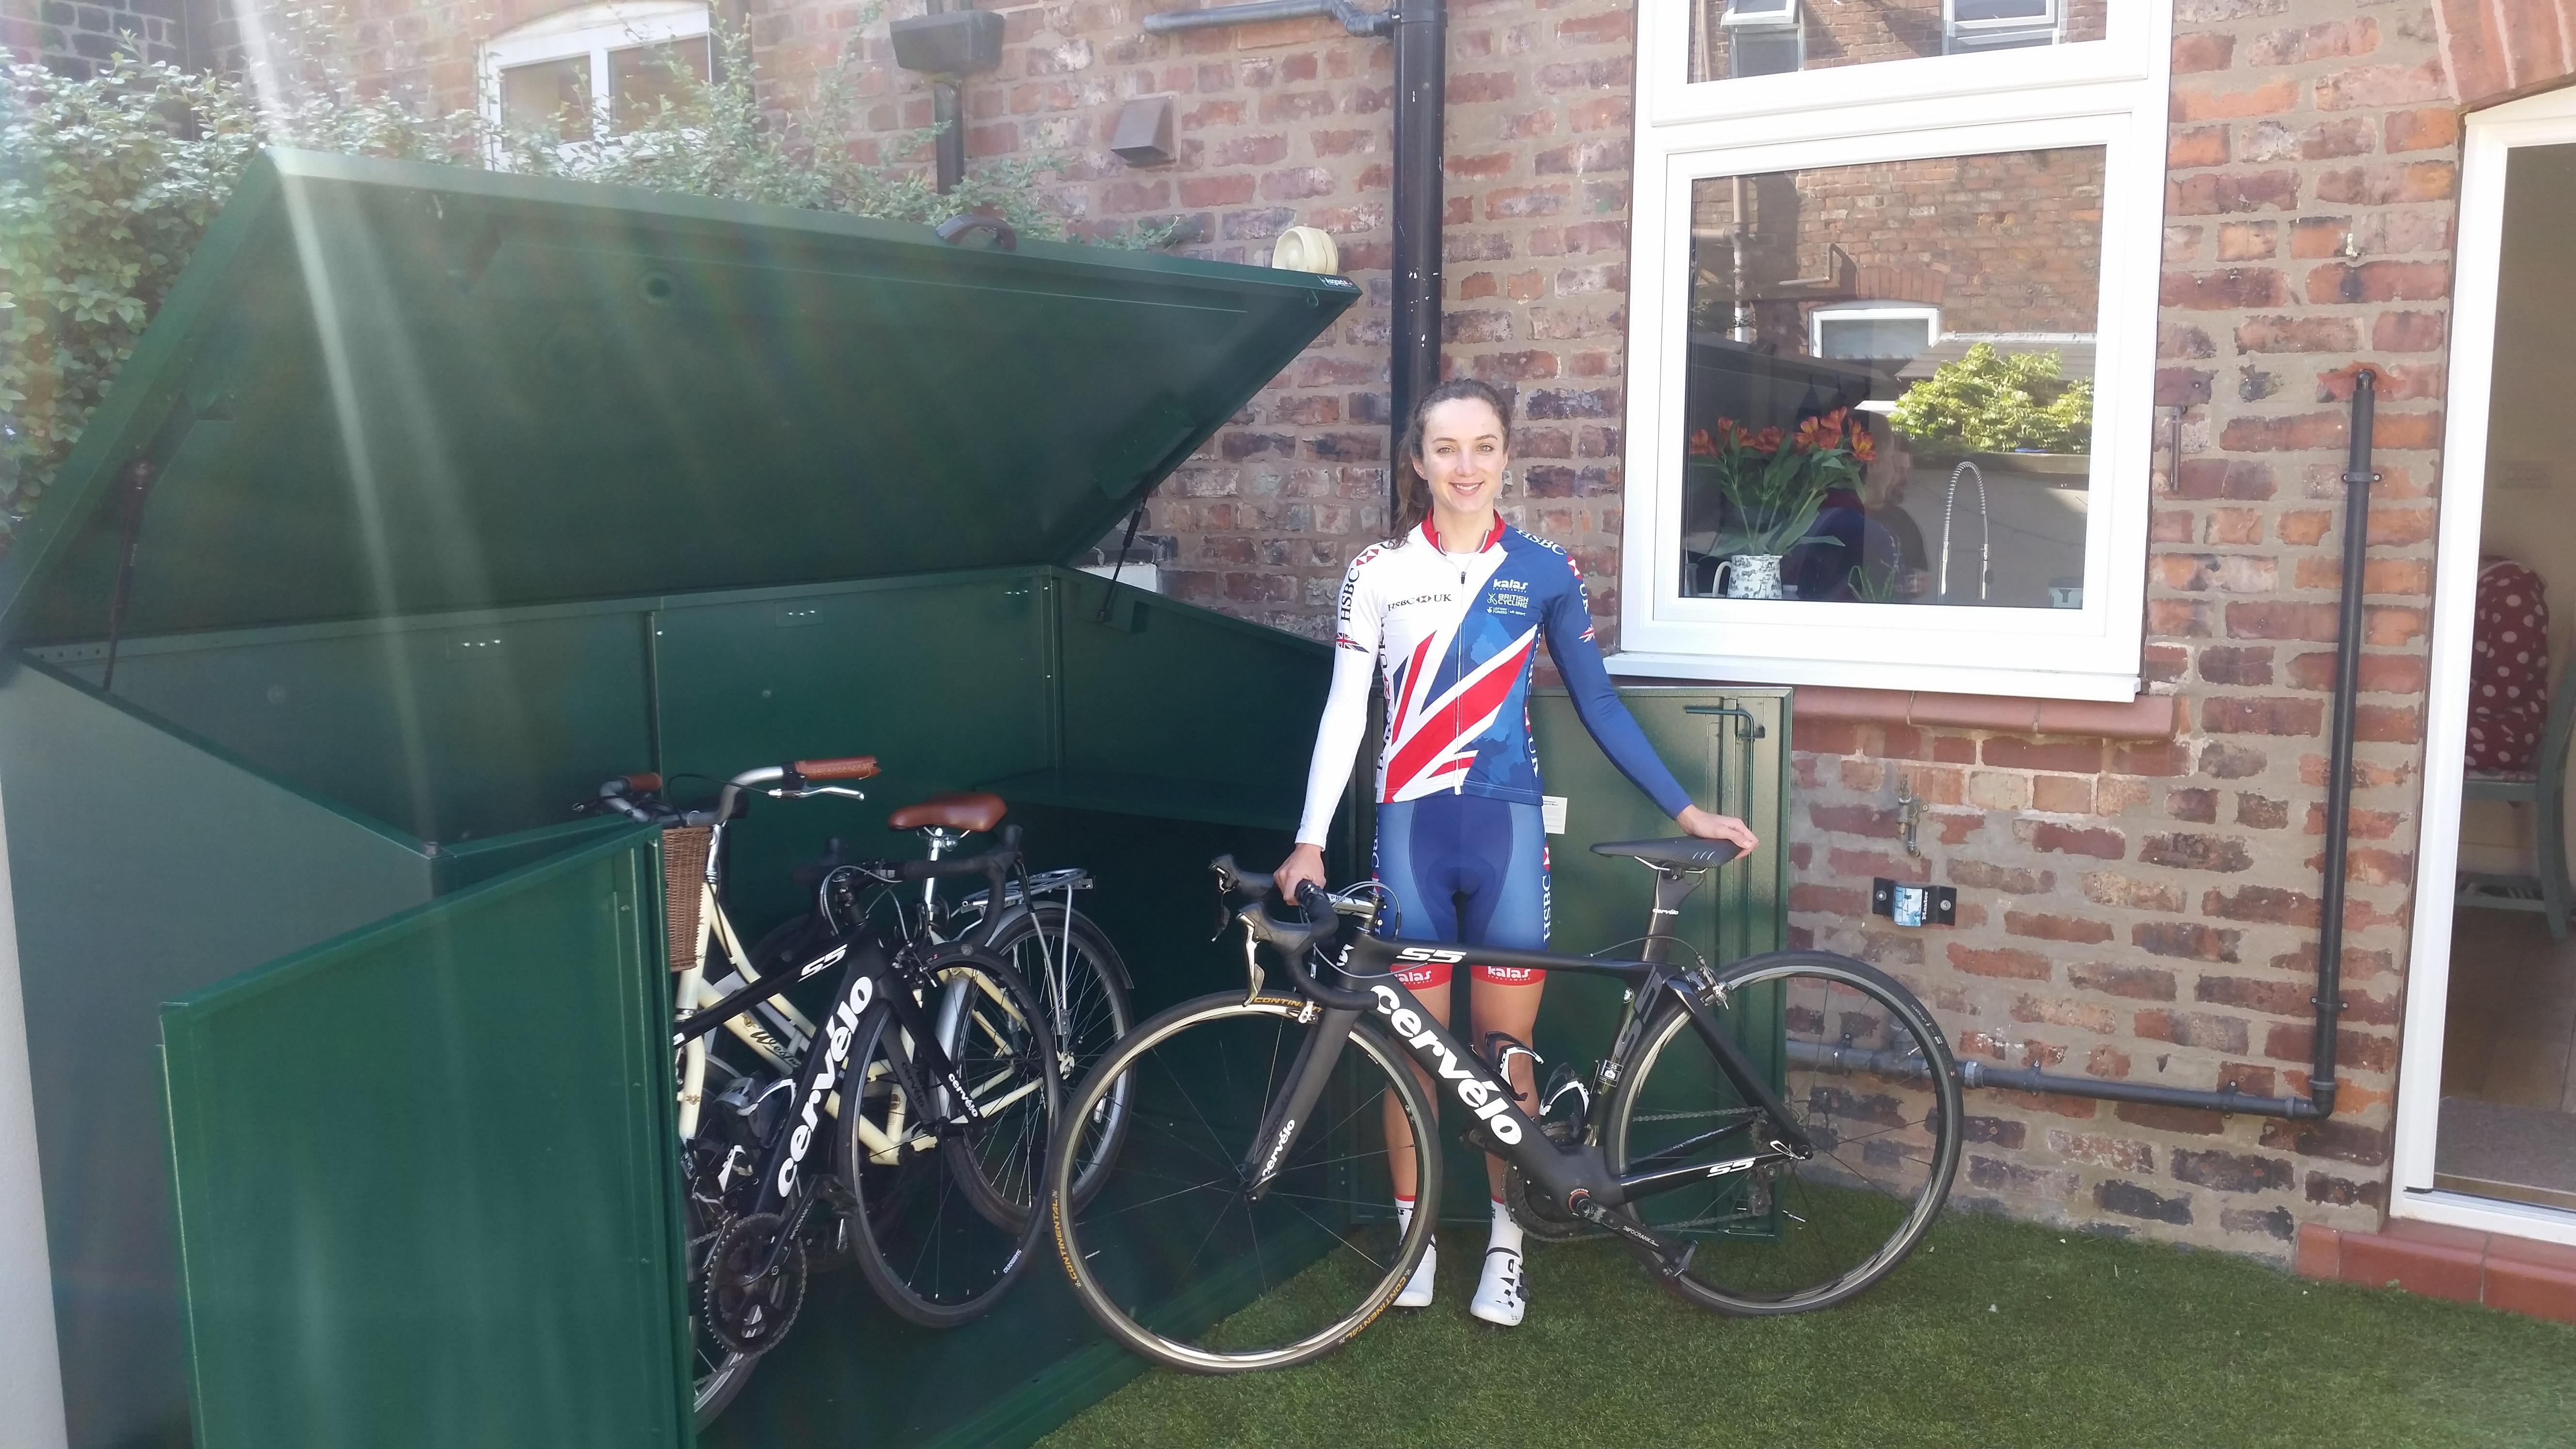 Elinor Barker Team GB Kit & Asgard Bike Shed